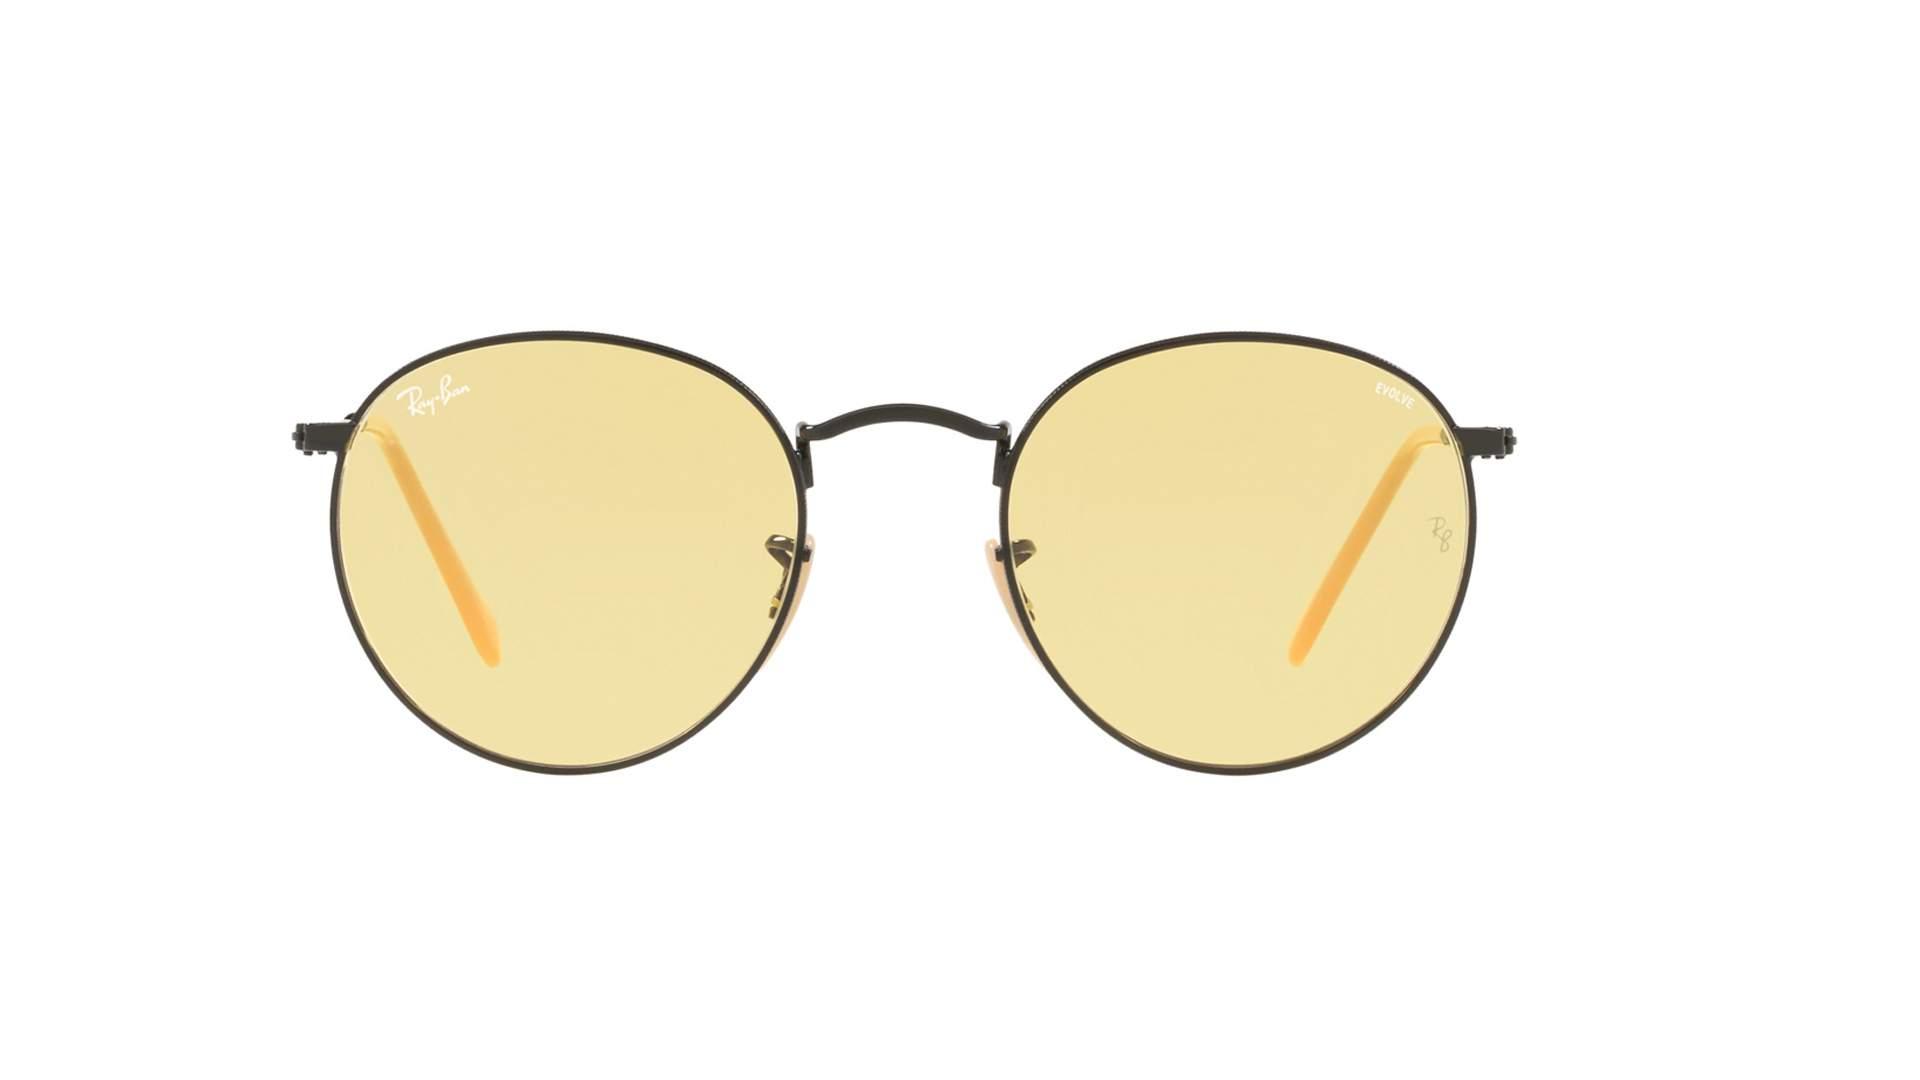 3ac9528430 Sunglasses Ray-Ban Round Evolve Black Matte RB3447 9066 4A 50-21 Medium  Photochromic